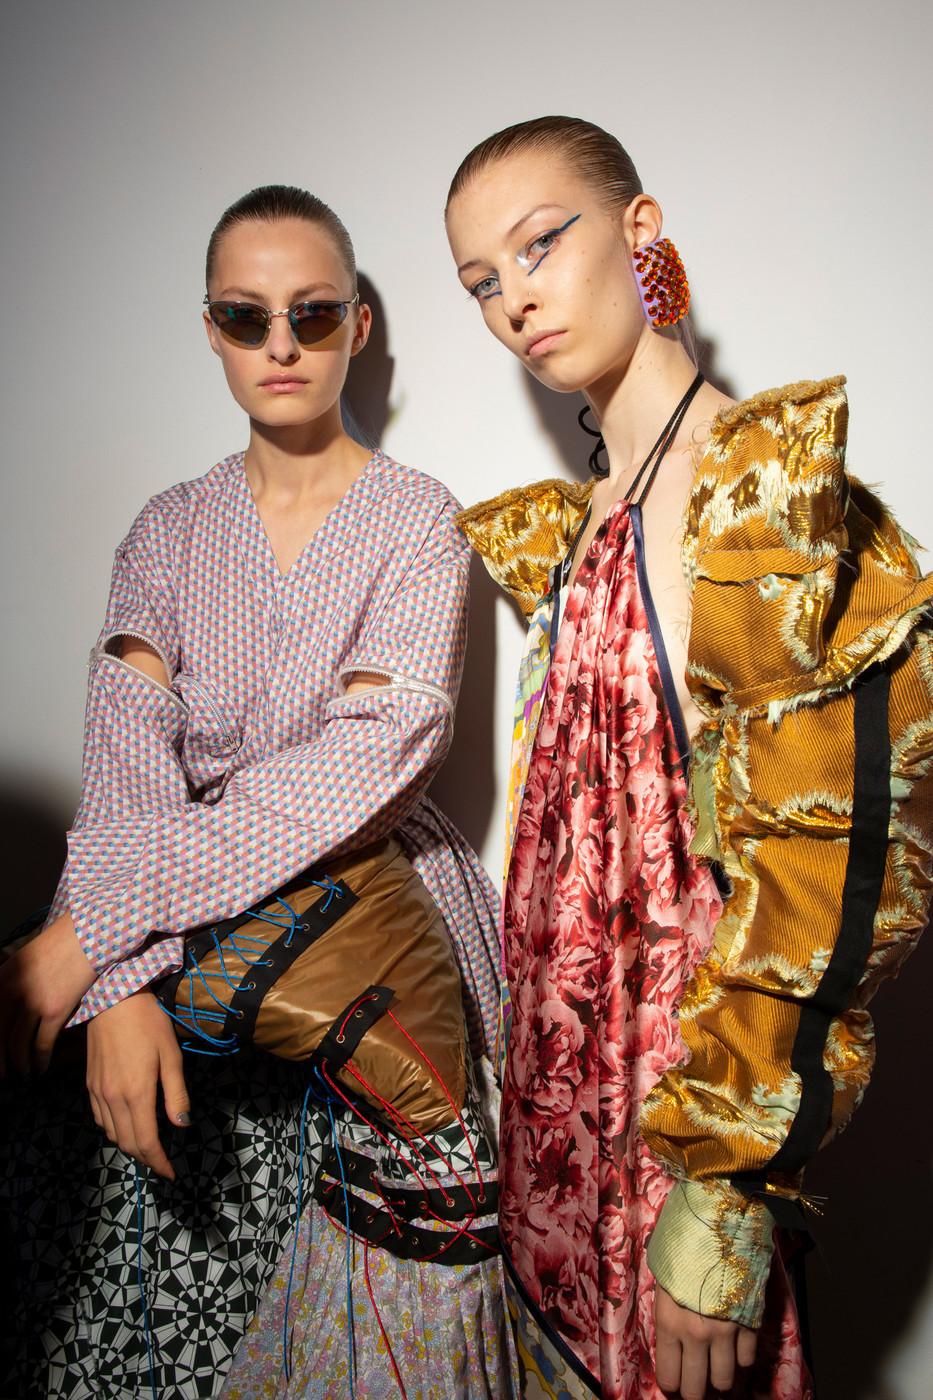 Matty Bowan At London Fashion Week Spring 2020 Fashion Fashion Week Spring London Fashion Week